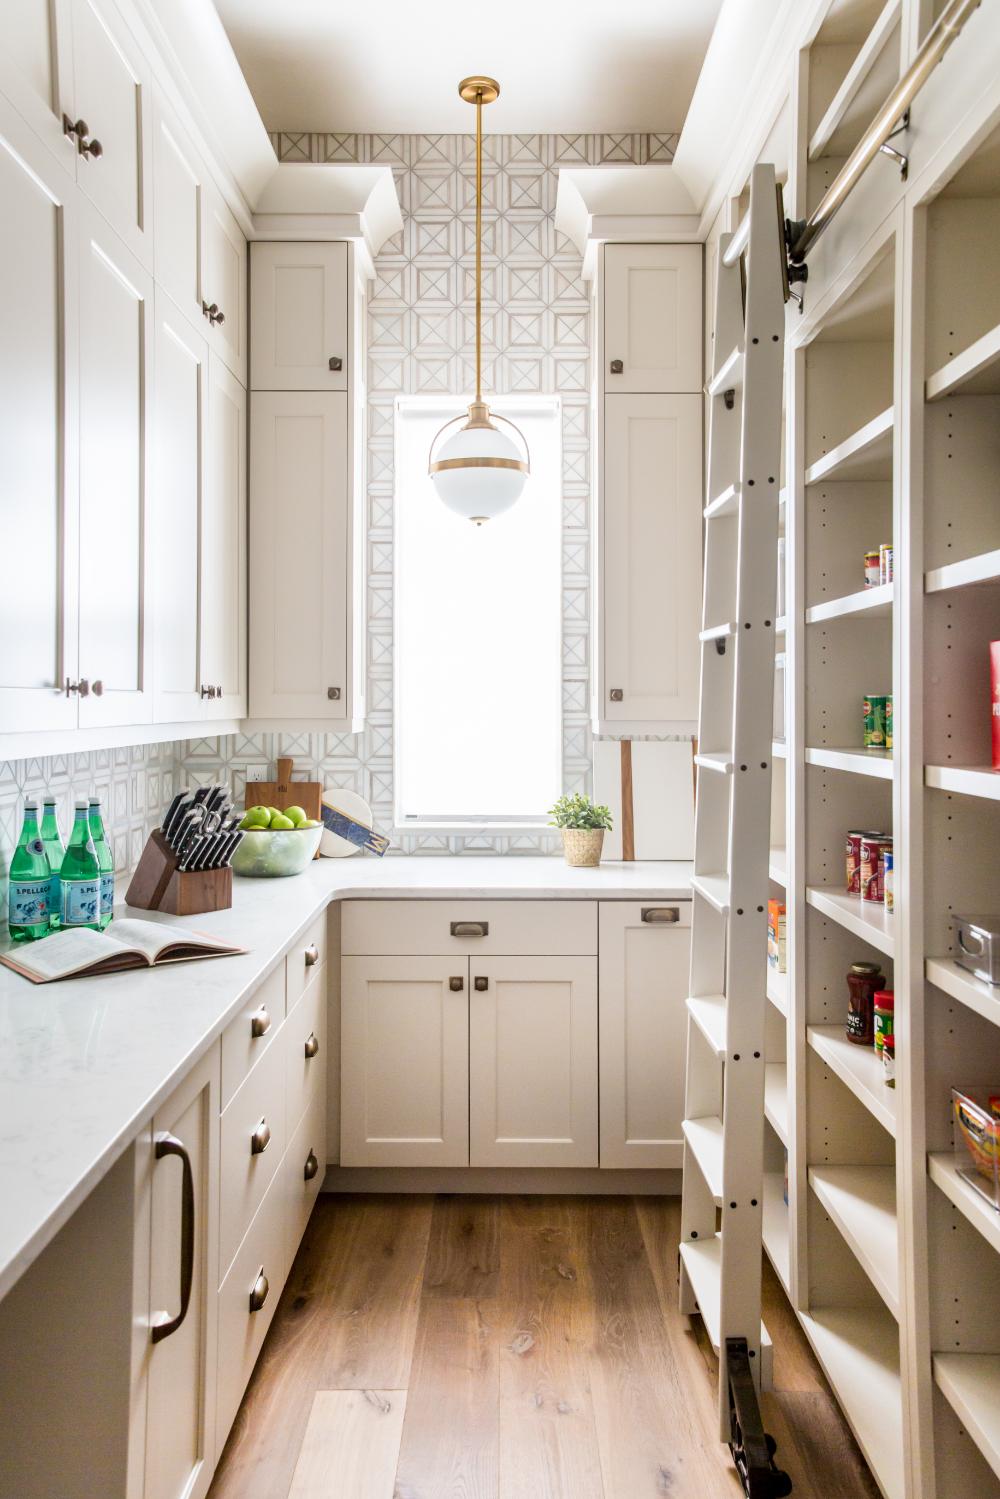 The Smi Inland Coastal Kitchen Reveal In 2020 Kitchen Butlers